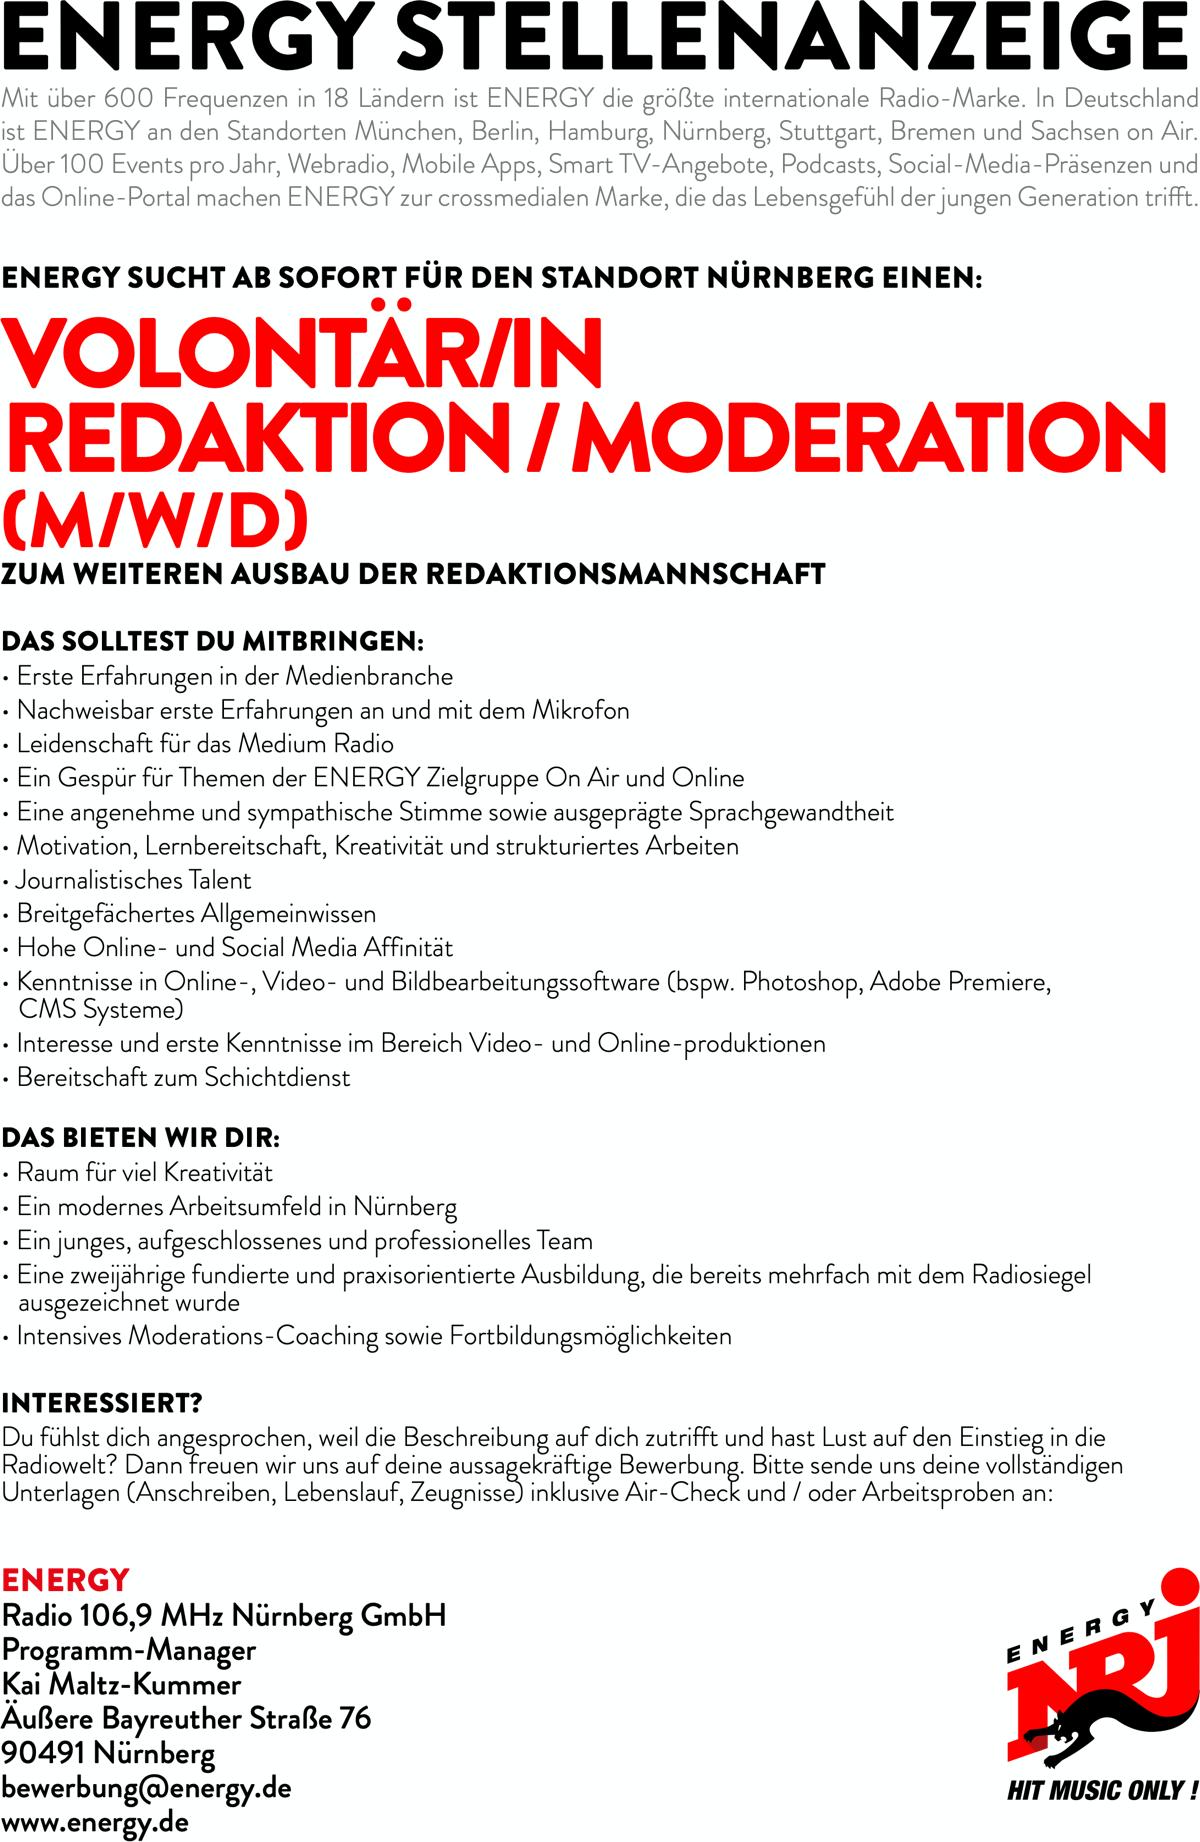 ENERGY Nürnberg sucht Volontär/in Redaktion/Moderation (m/w/d)